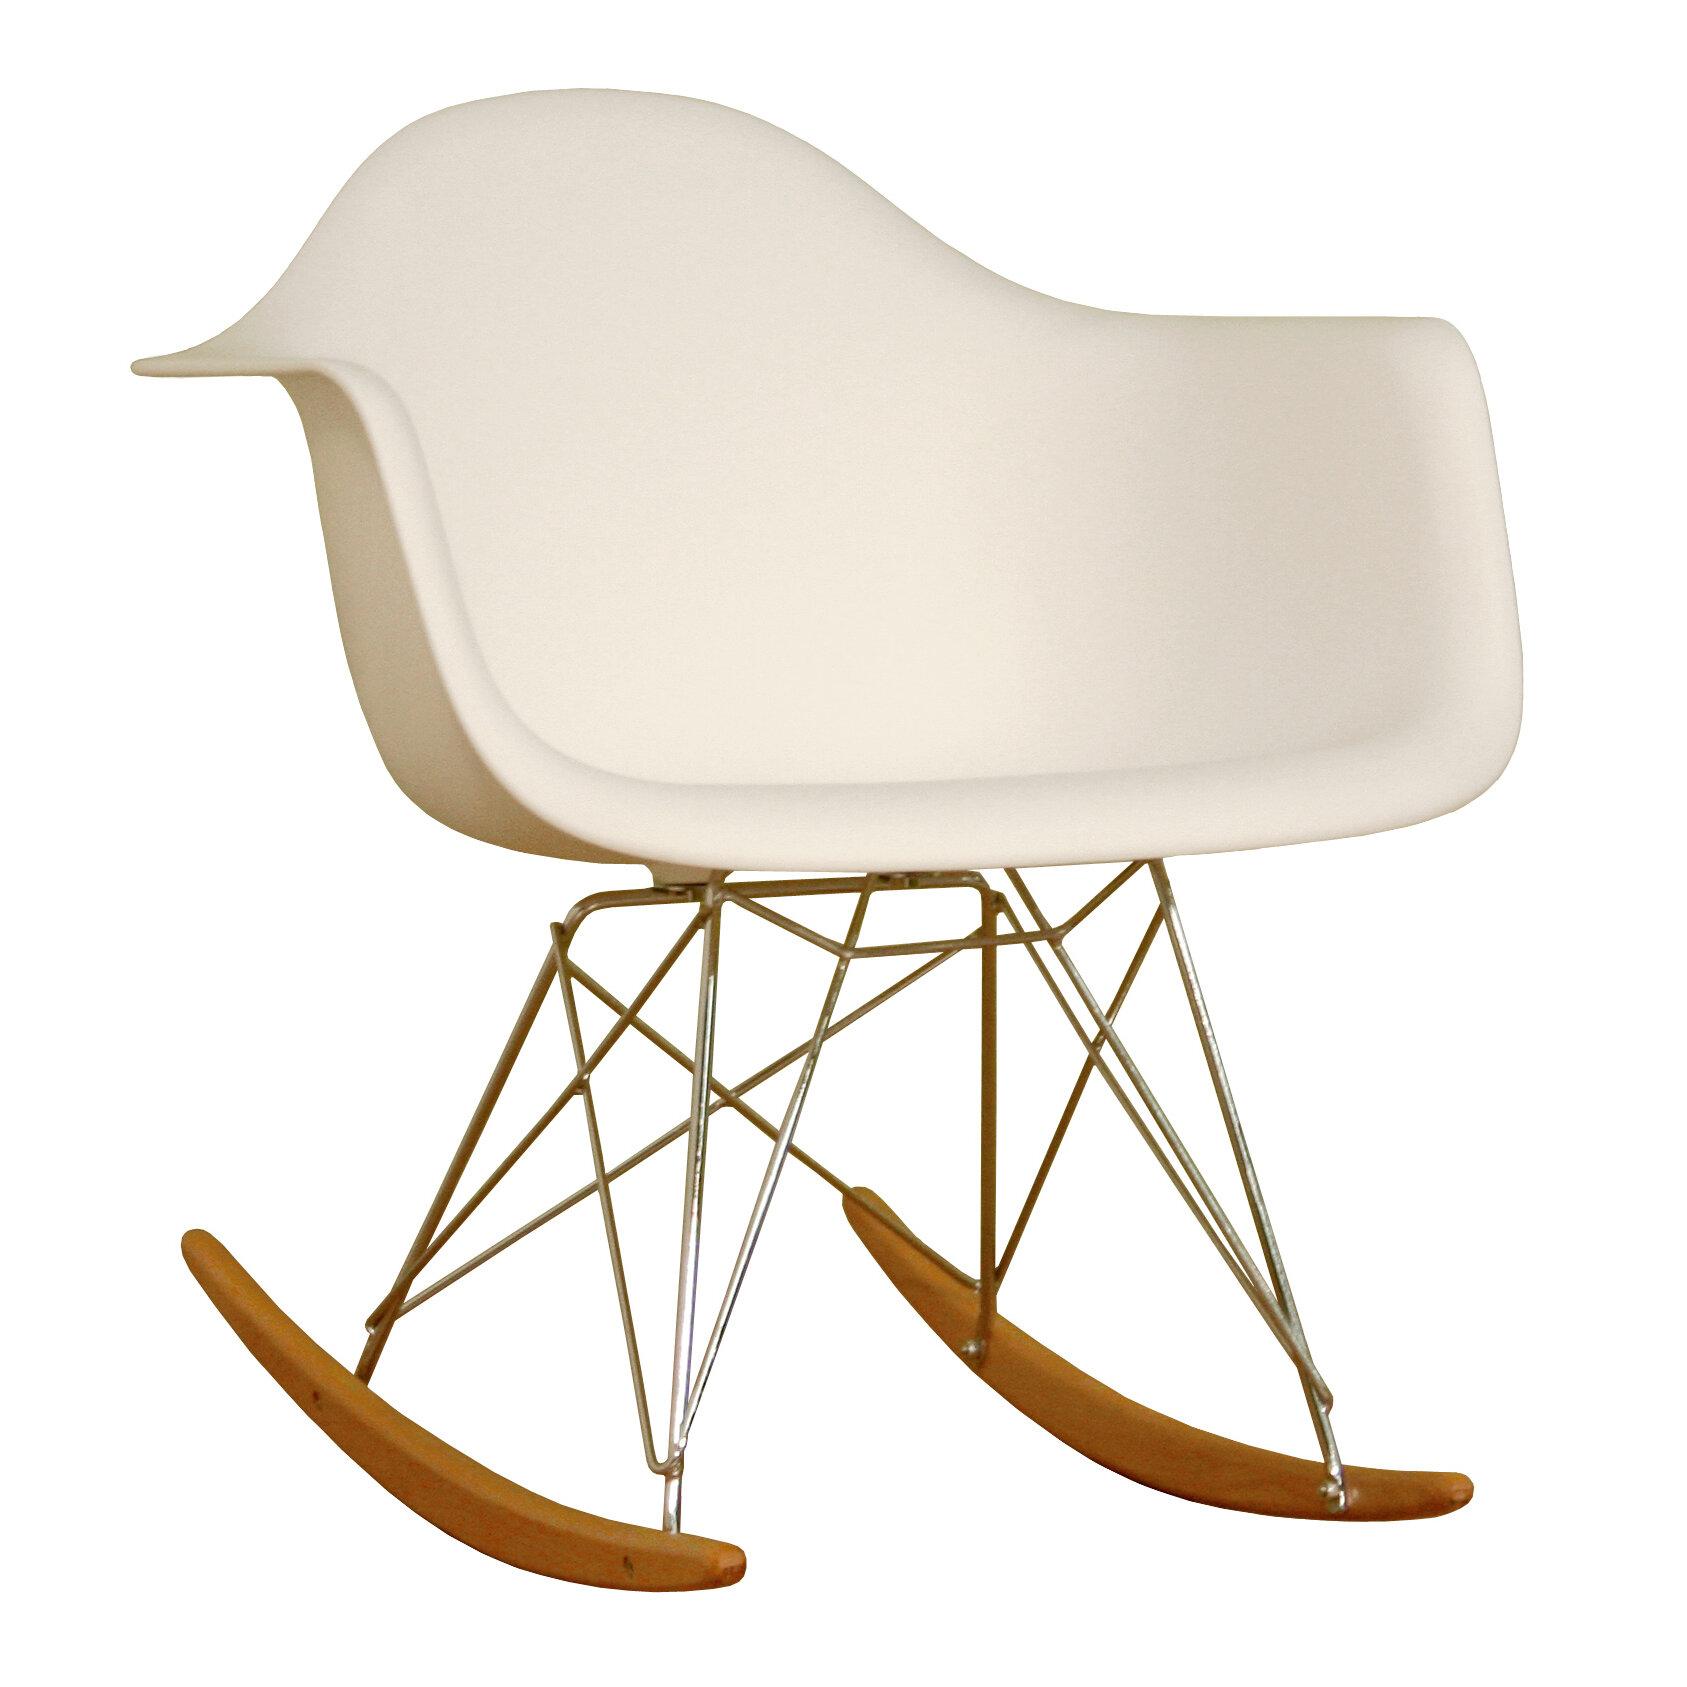 wholesale interiors baxton studio mid century modern rocking chair